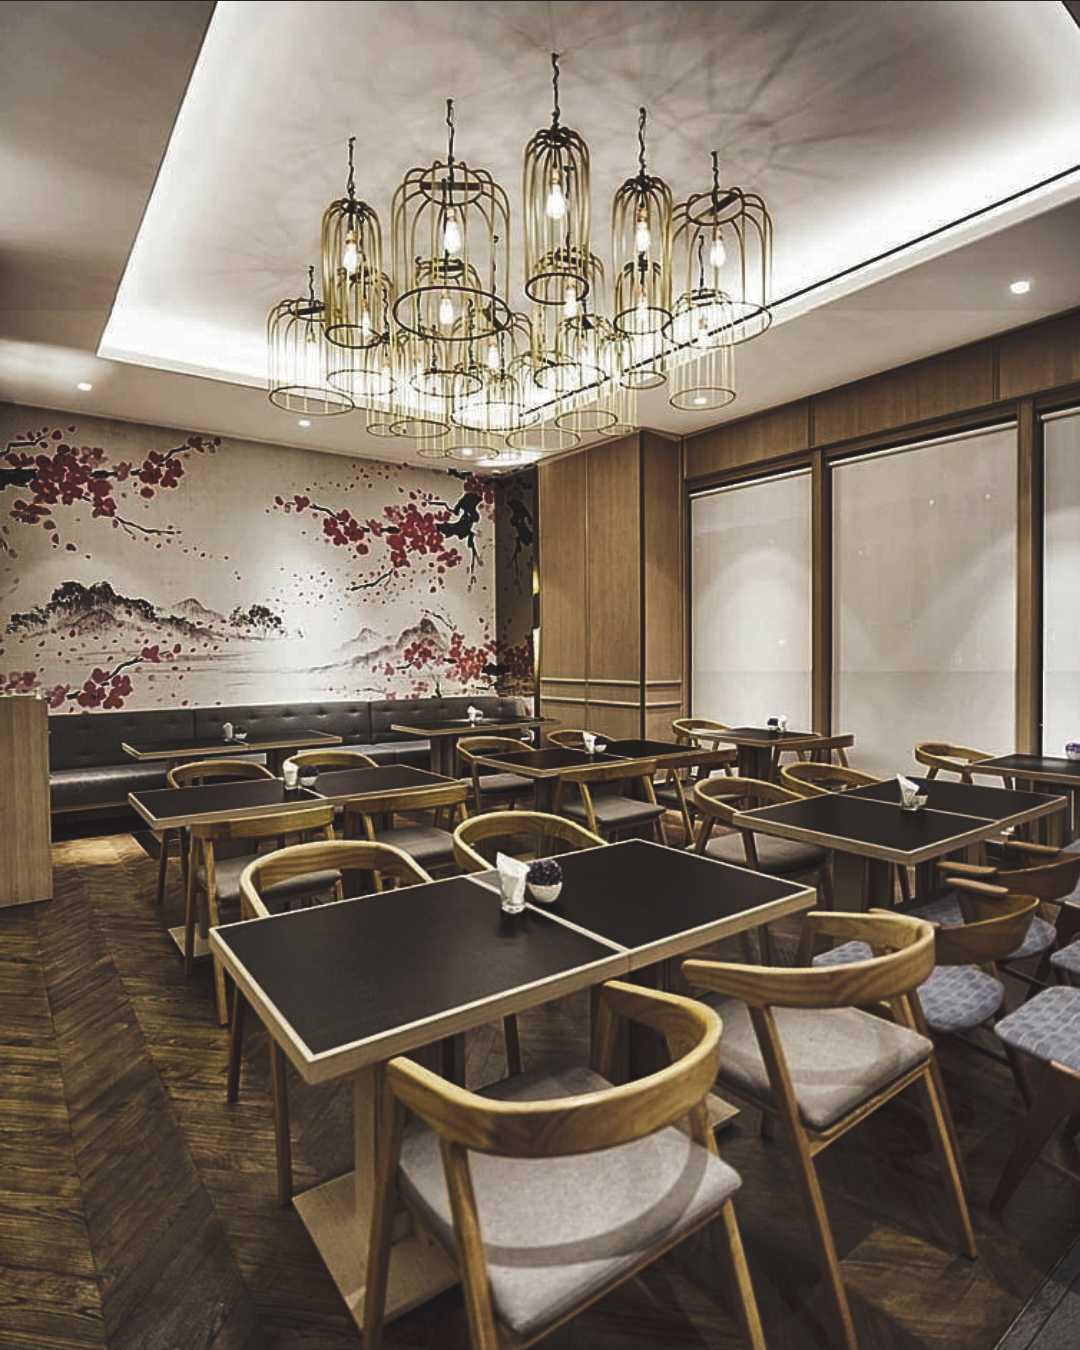 Q Studio O  Japanese Restaurant Jakarta Utara, Kota Jkt Utara, Daerah Khusus Ibukota Jakarta, Indonesia Jakarta Utara, Kota Jkt Utara, Daerah Khusus Ibukota Jakarta, Indonesia Q-Studio-O-Restaurant  125032